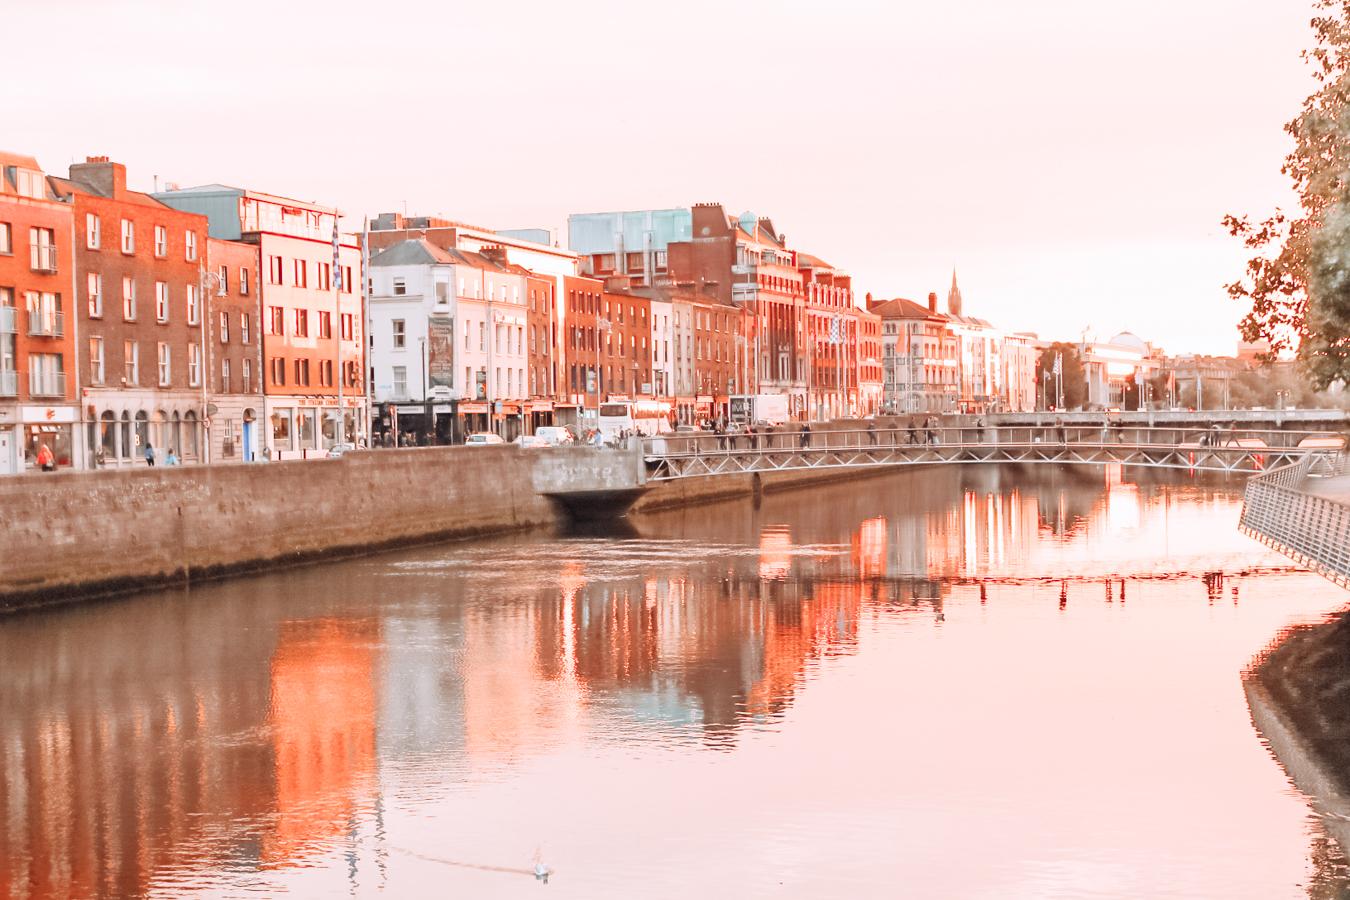 Water, buildings and a bridge in Dublin